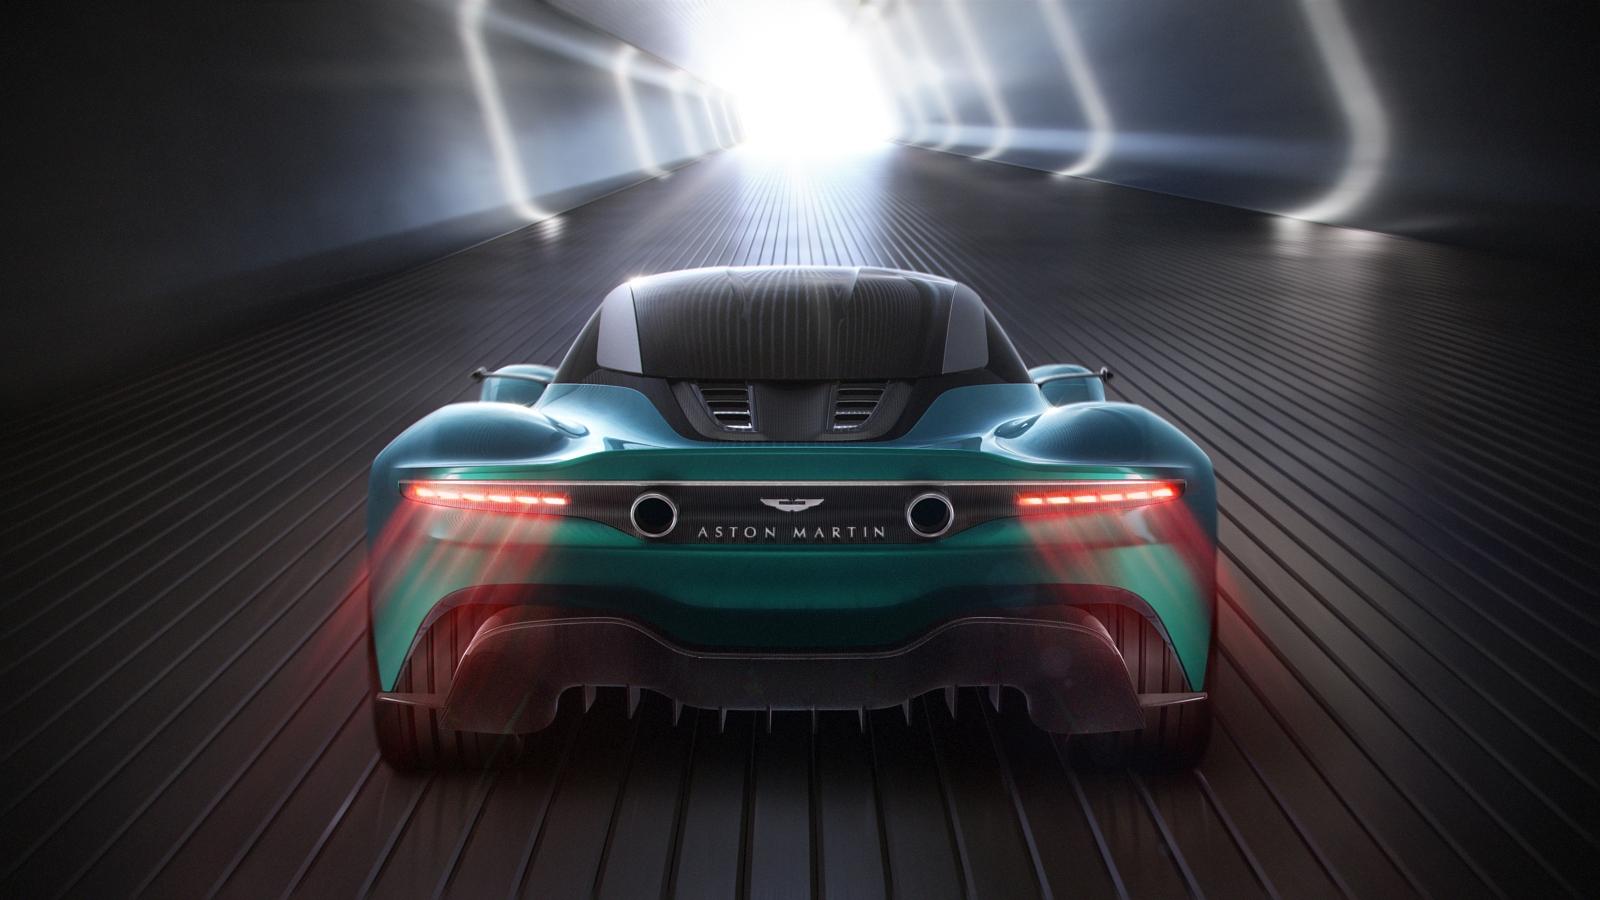 Aston Martin Valkyrie, AM-RB 003, Vanquish Vision Concept